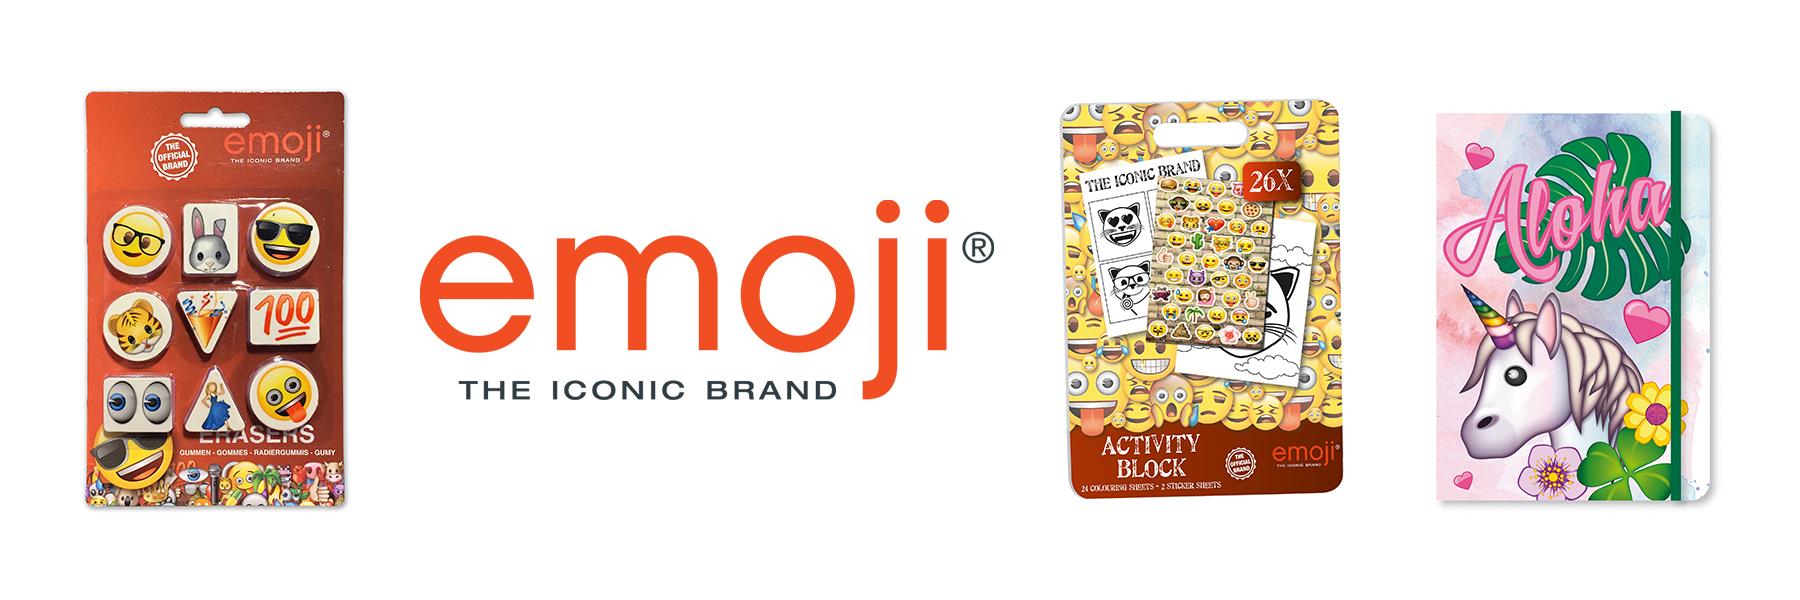 Highlight: Emoji – The Iconic Brand